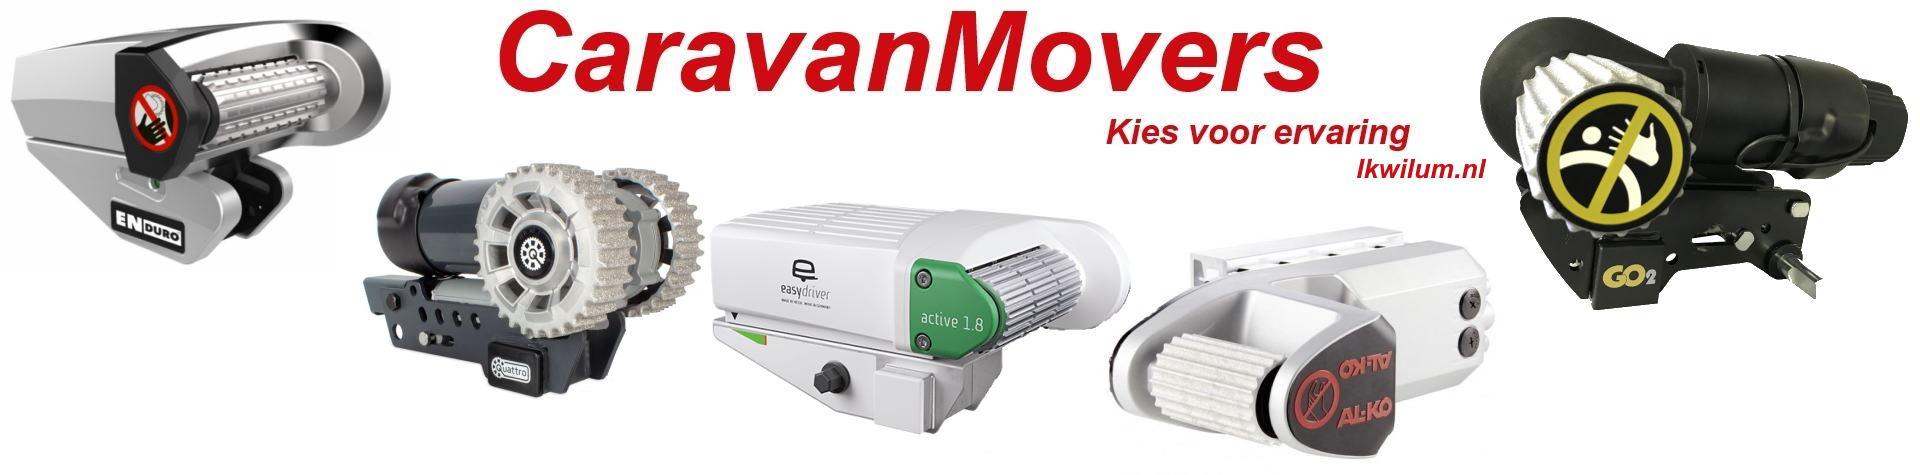 CaravanMovers